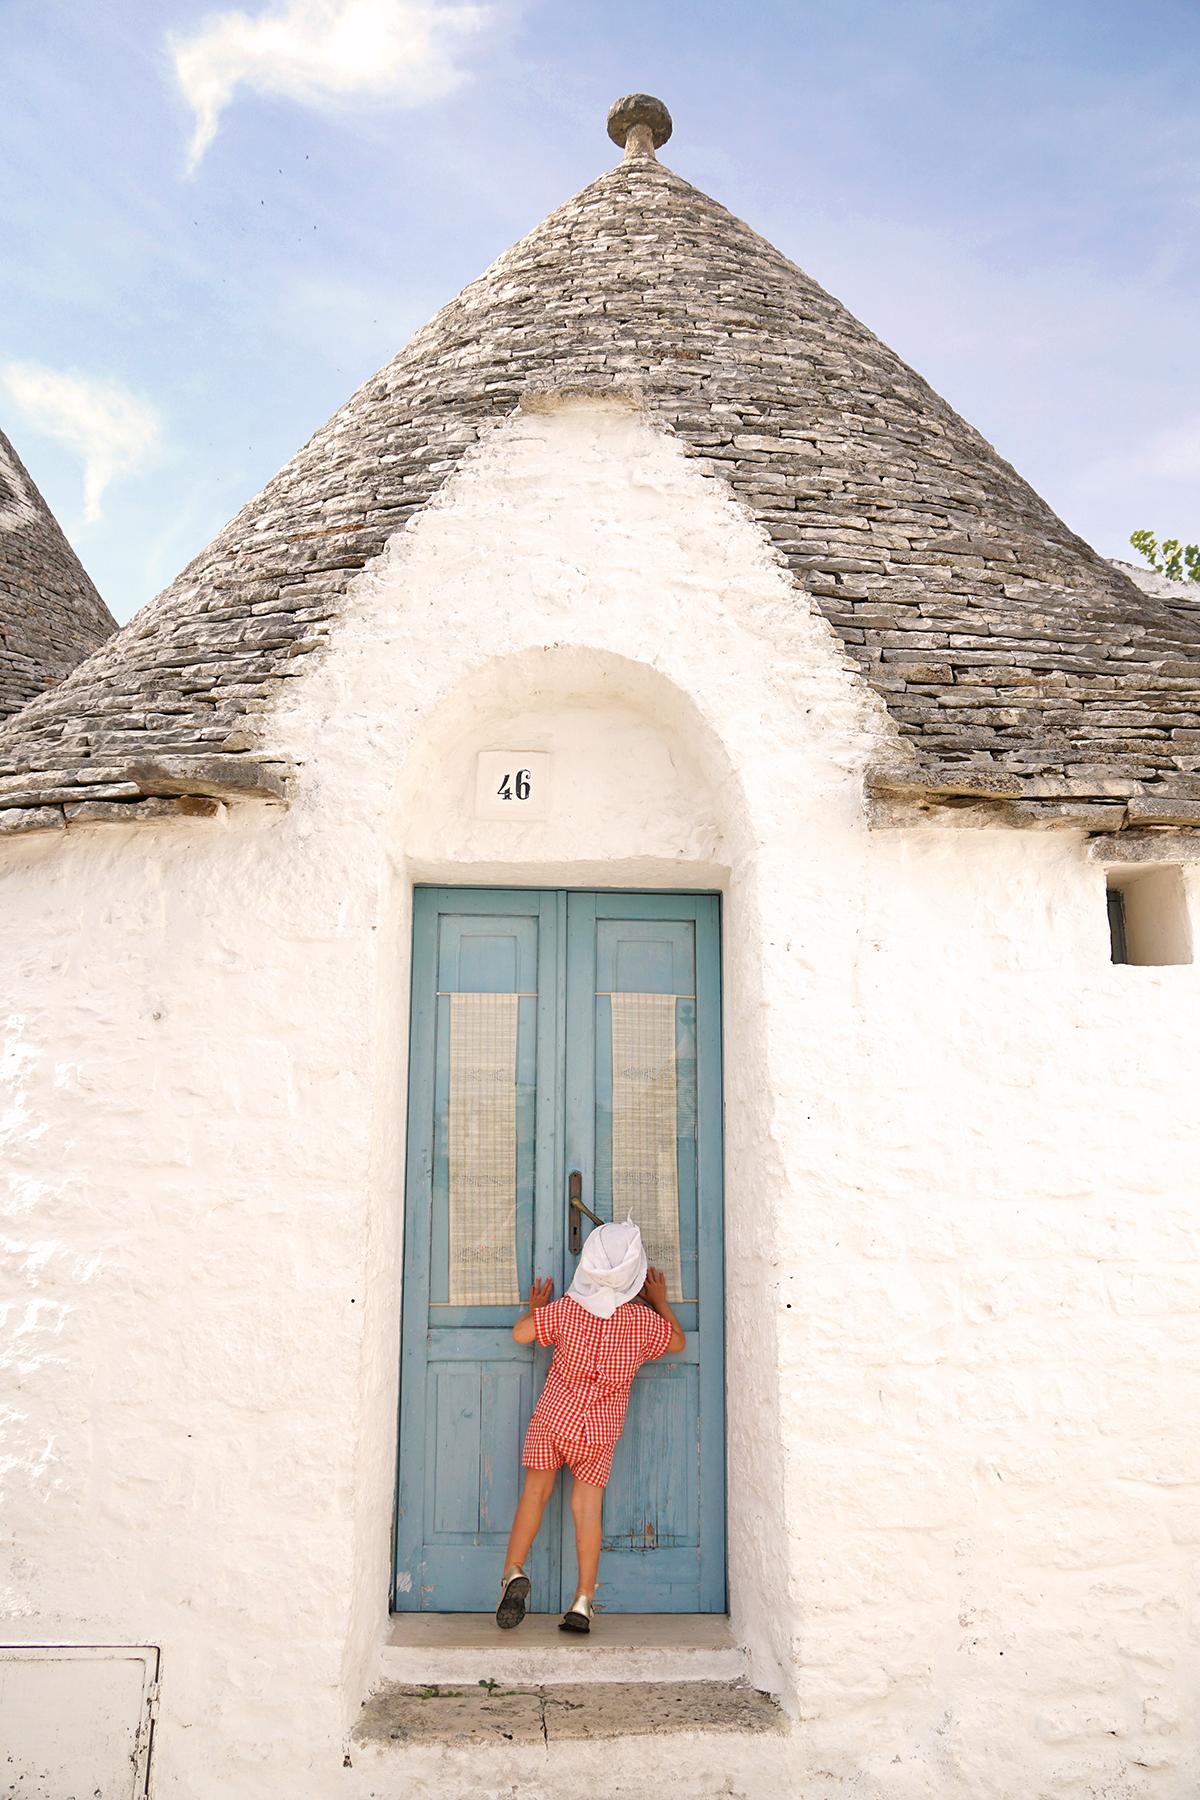 Petite fille à Alberobello, Pouilles Italie